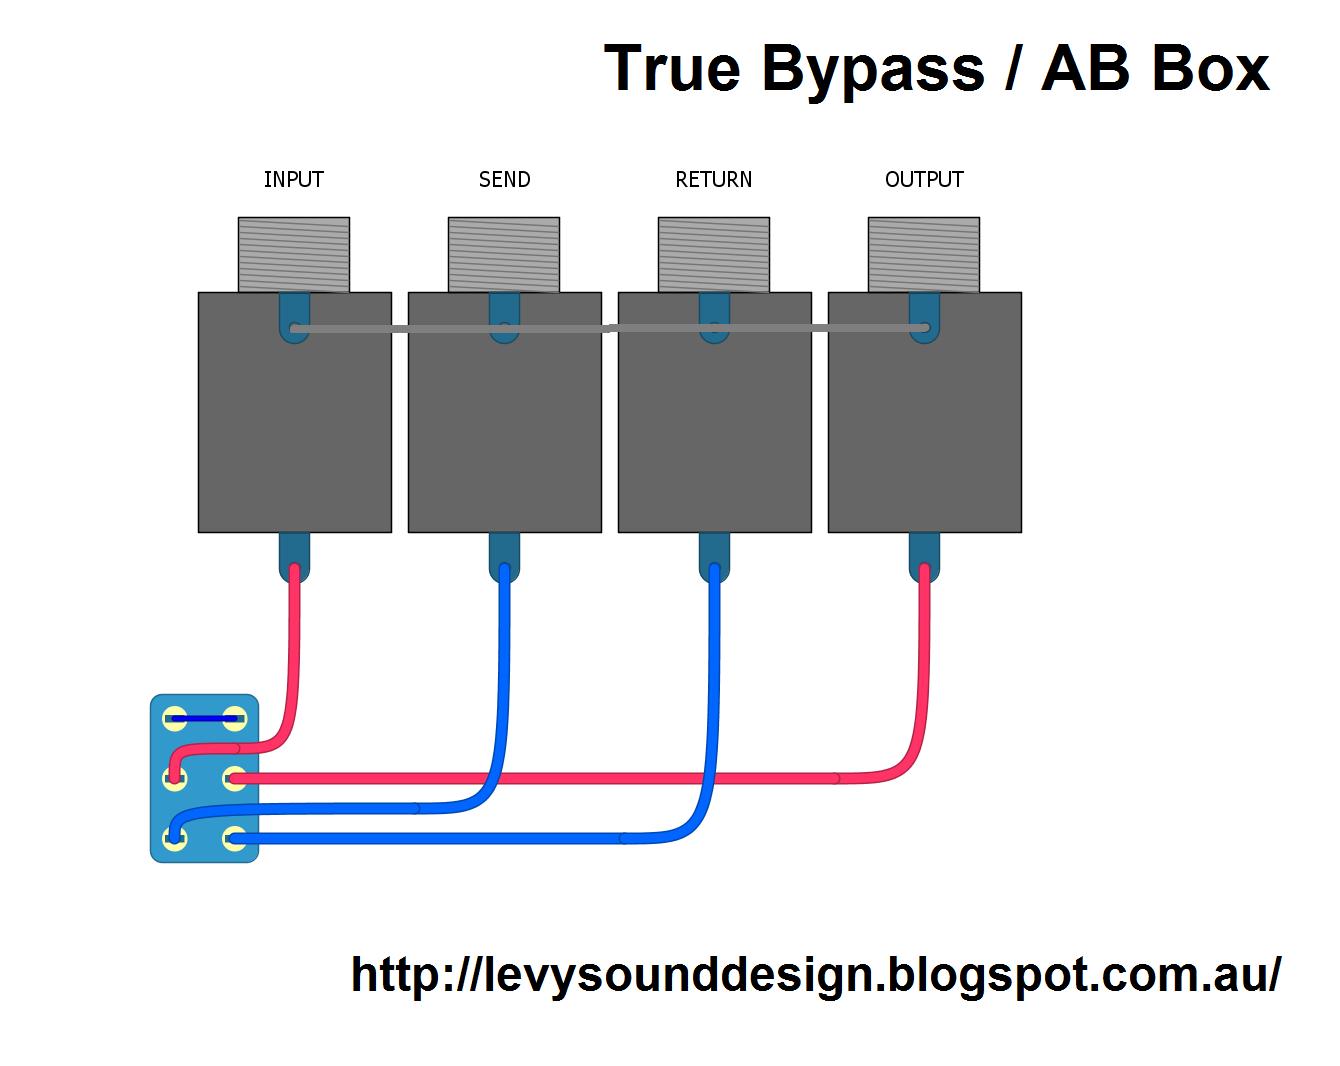 true bypass looper wiring diagram 2000 honda civic exhaust system pedal byp schematic tire schematics elsavadorla